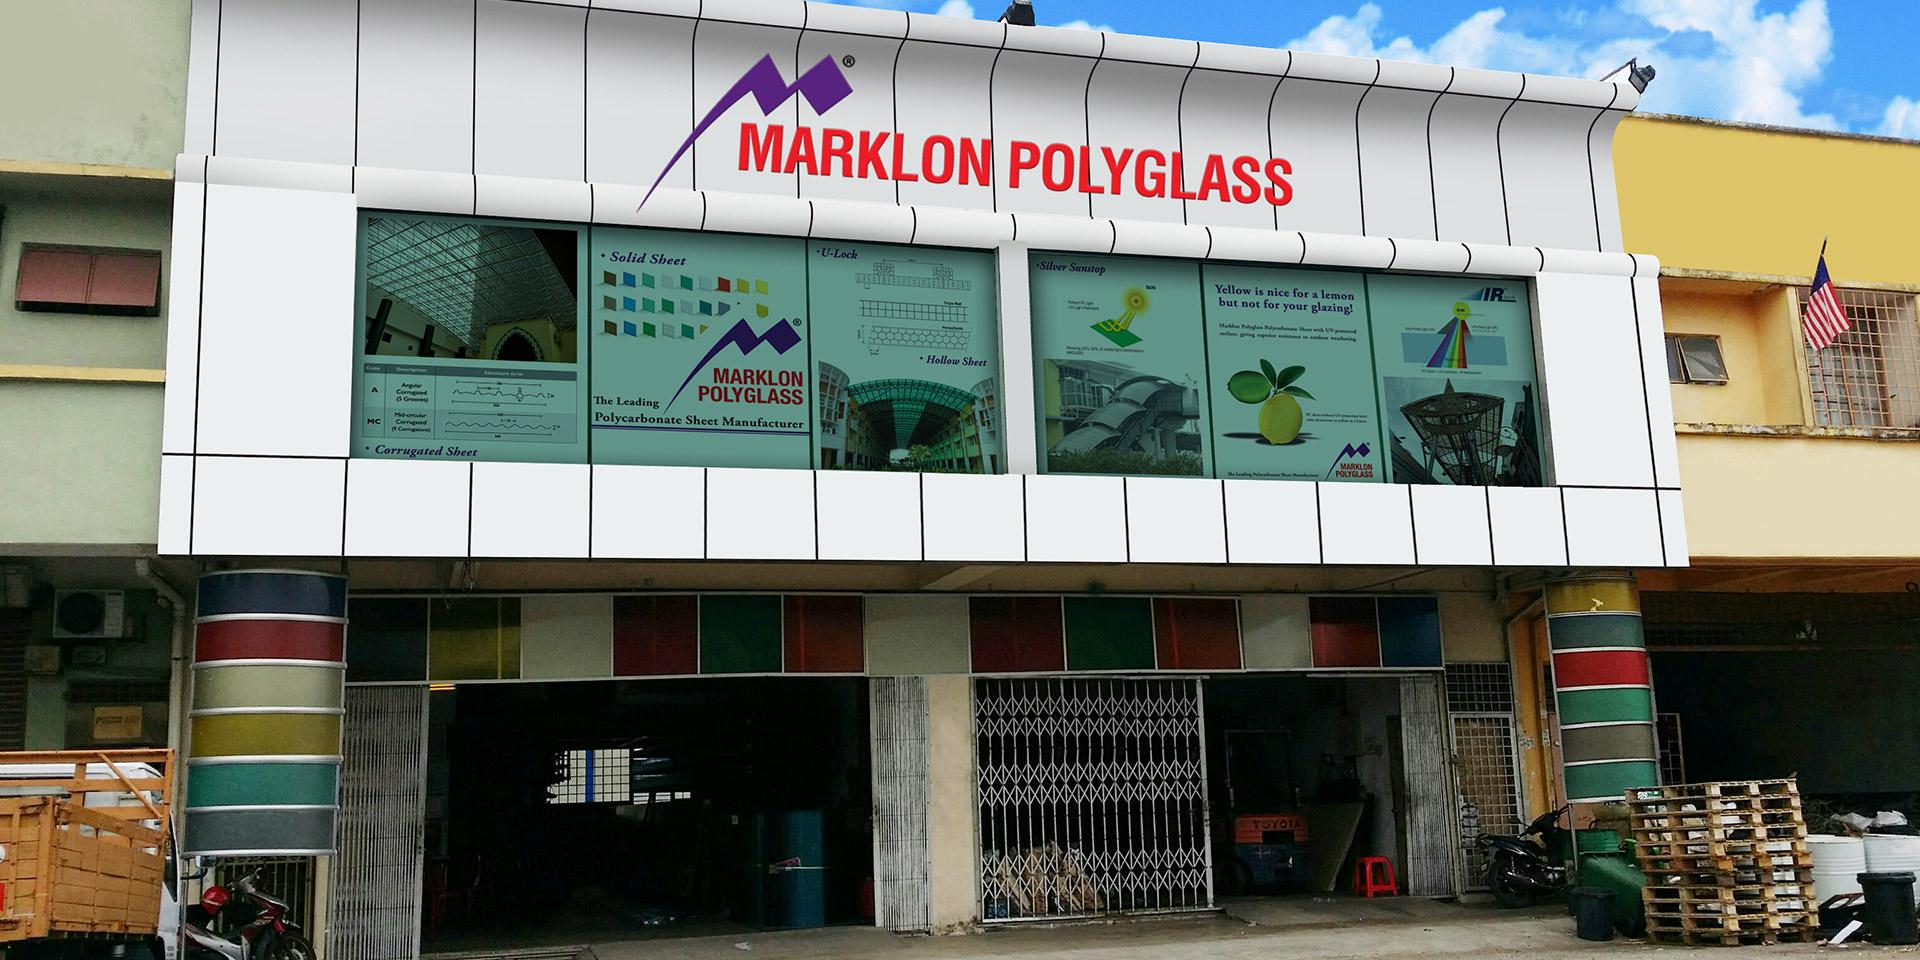 tấm lợp lấy sáng polycarbonate malaysia